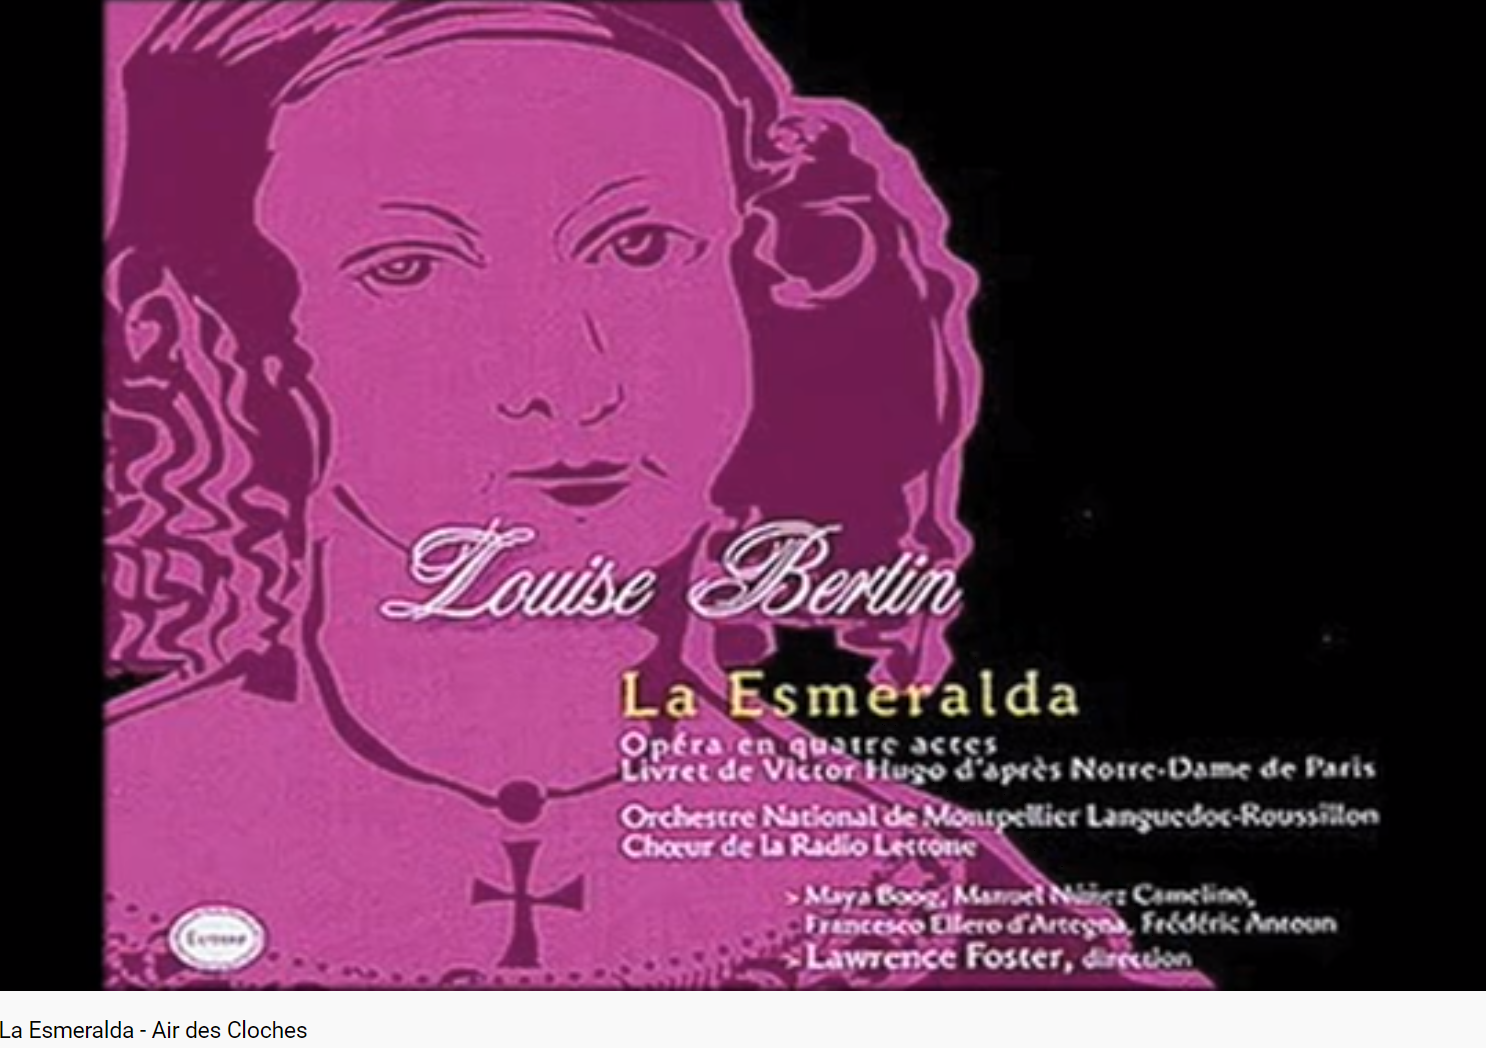 Bertin la Esmeralda